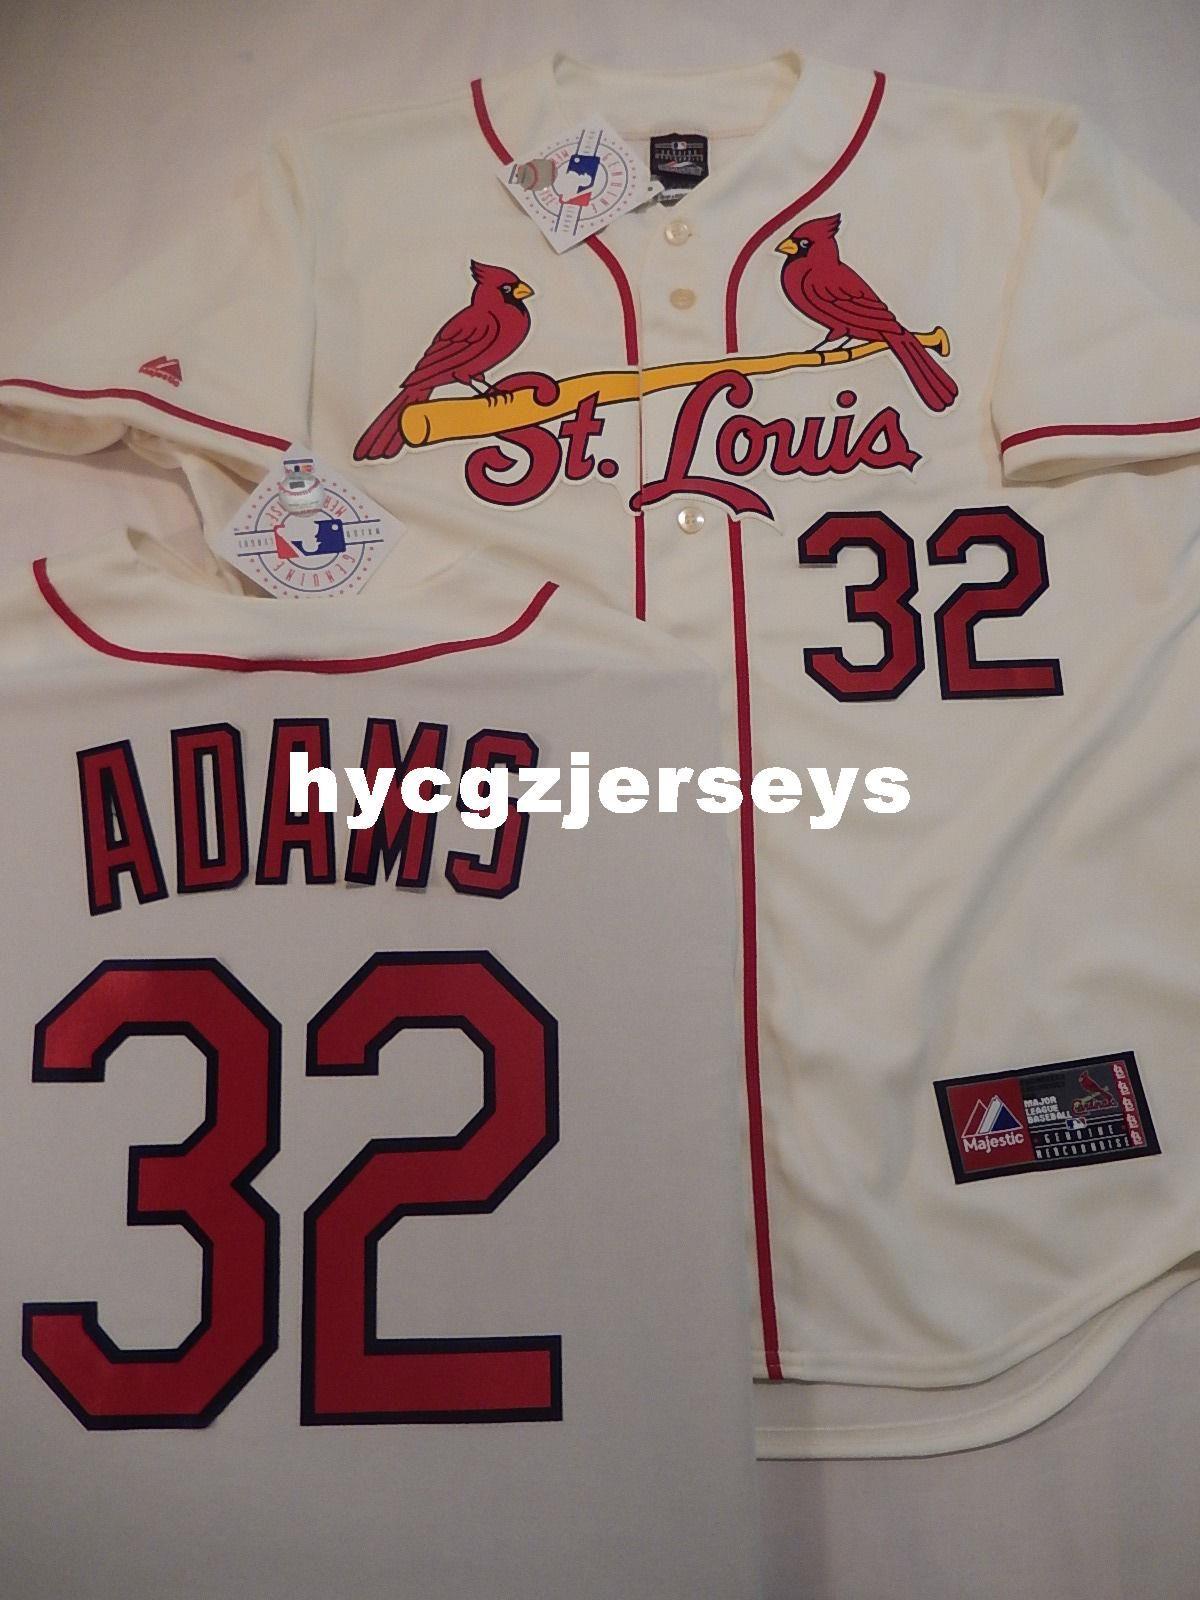 baseball pas cher Sc # 32 MATT ADAMS COUSUES Alternate Jersey CRÈME Mens maillots cousu Big and Tall TAILLE XS-6XL à vendre